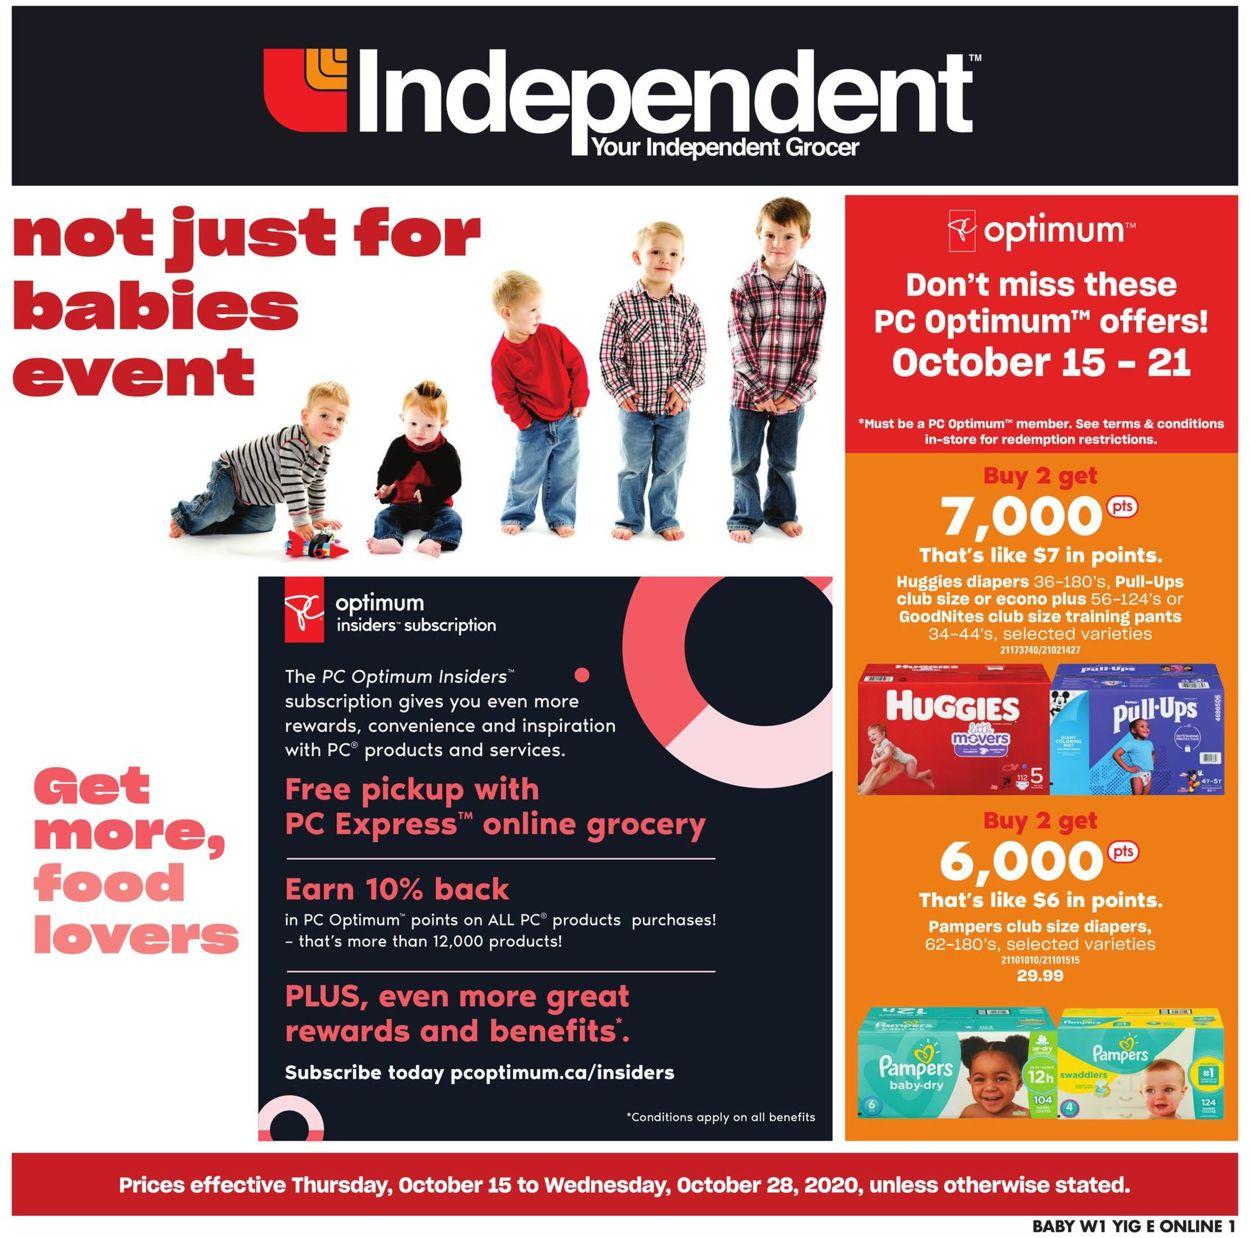 Independent Flyer - 10/15-10/28/2020